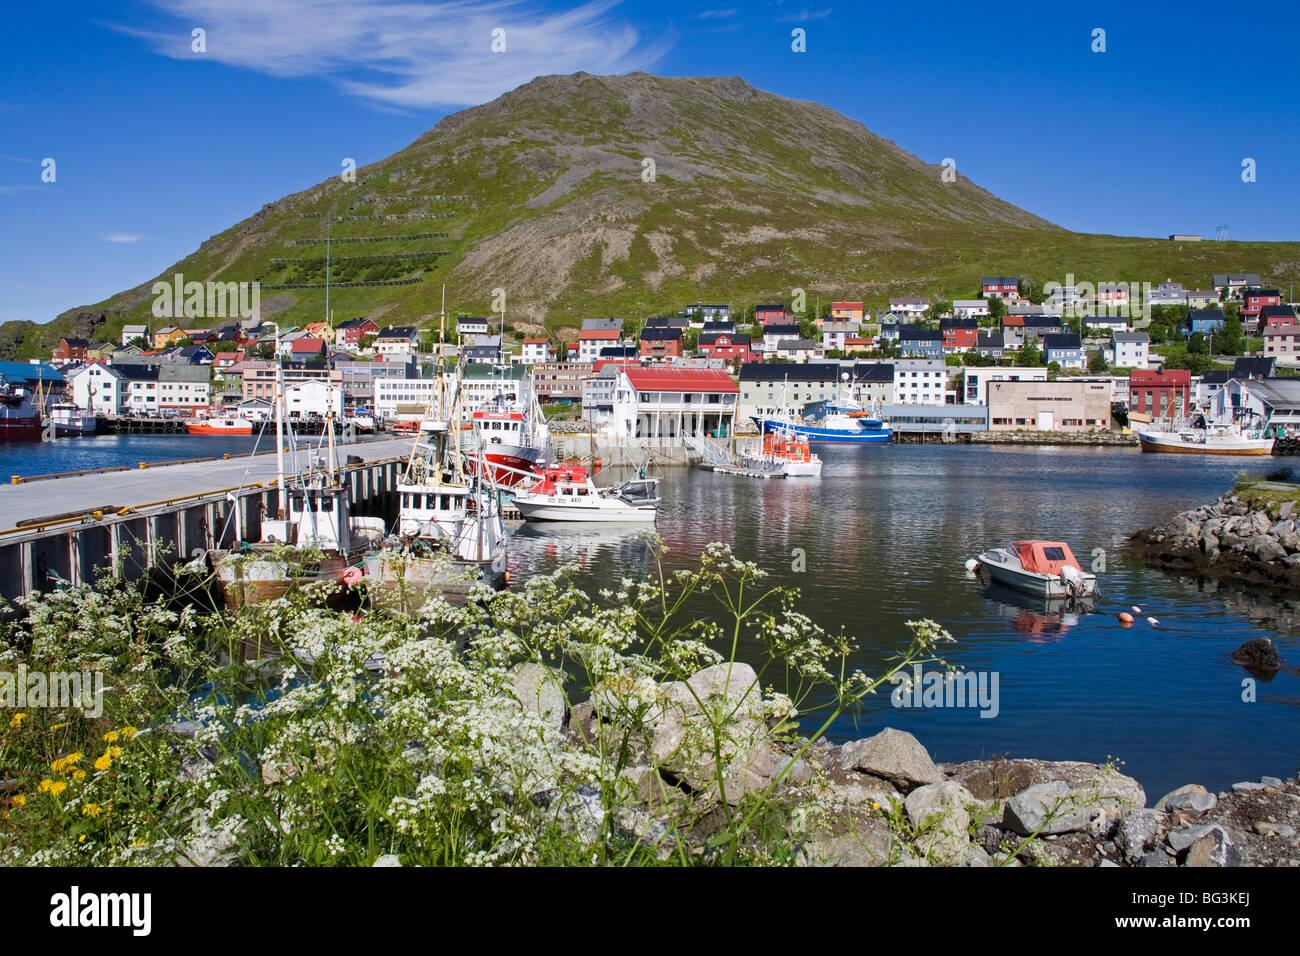 Honningsvag Port, Mageroya Island, Finnmark Region, Arctic Ocean, Norway, Scandinavia, Europe - Stock Image